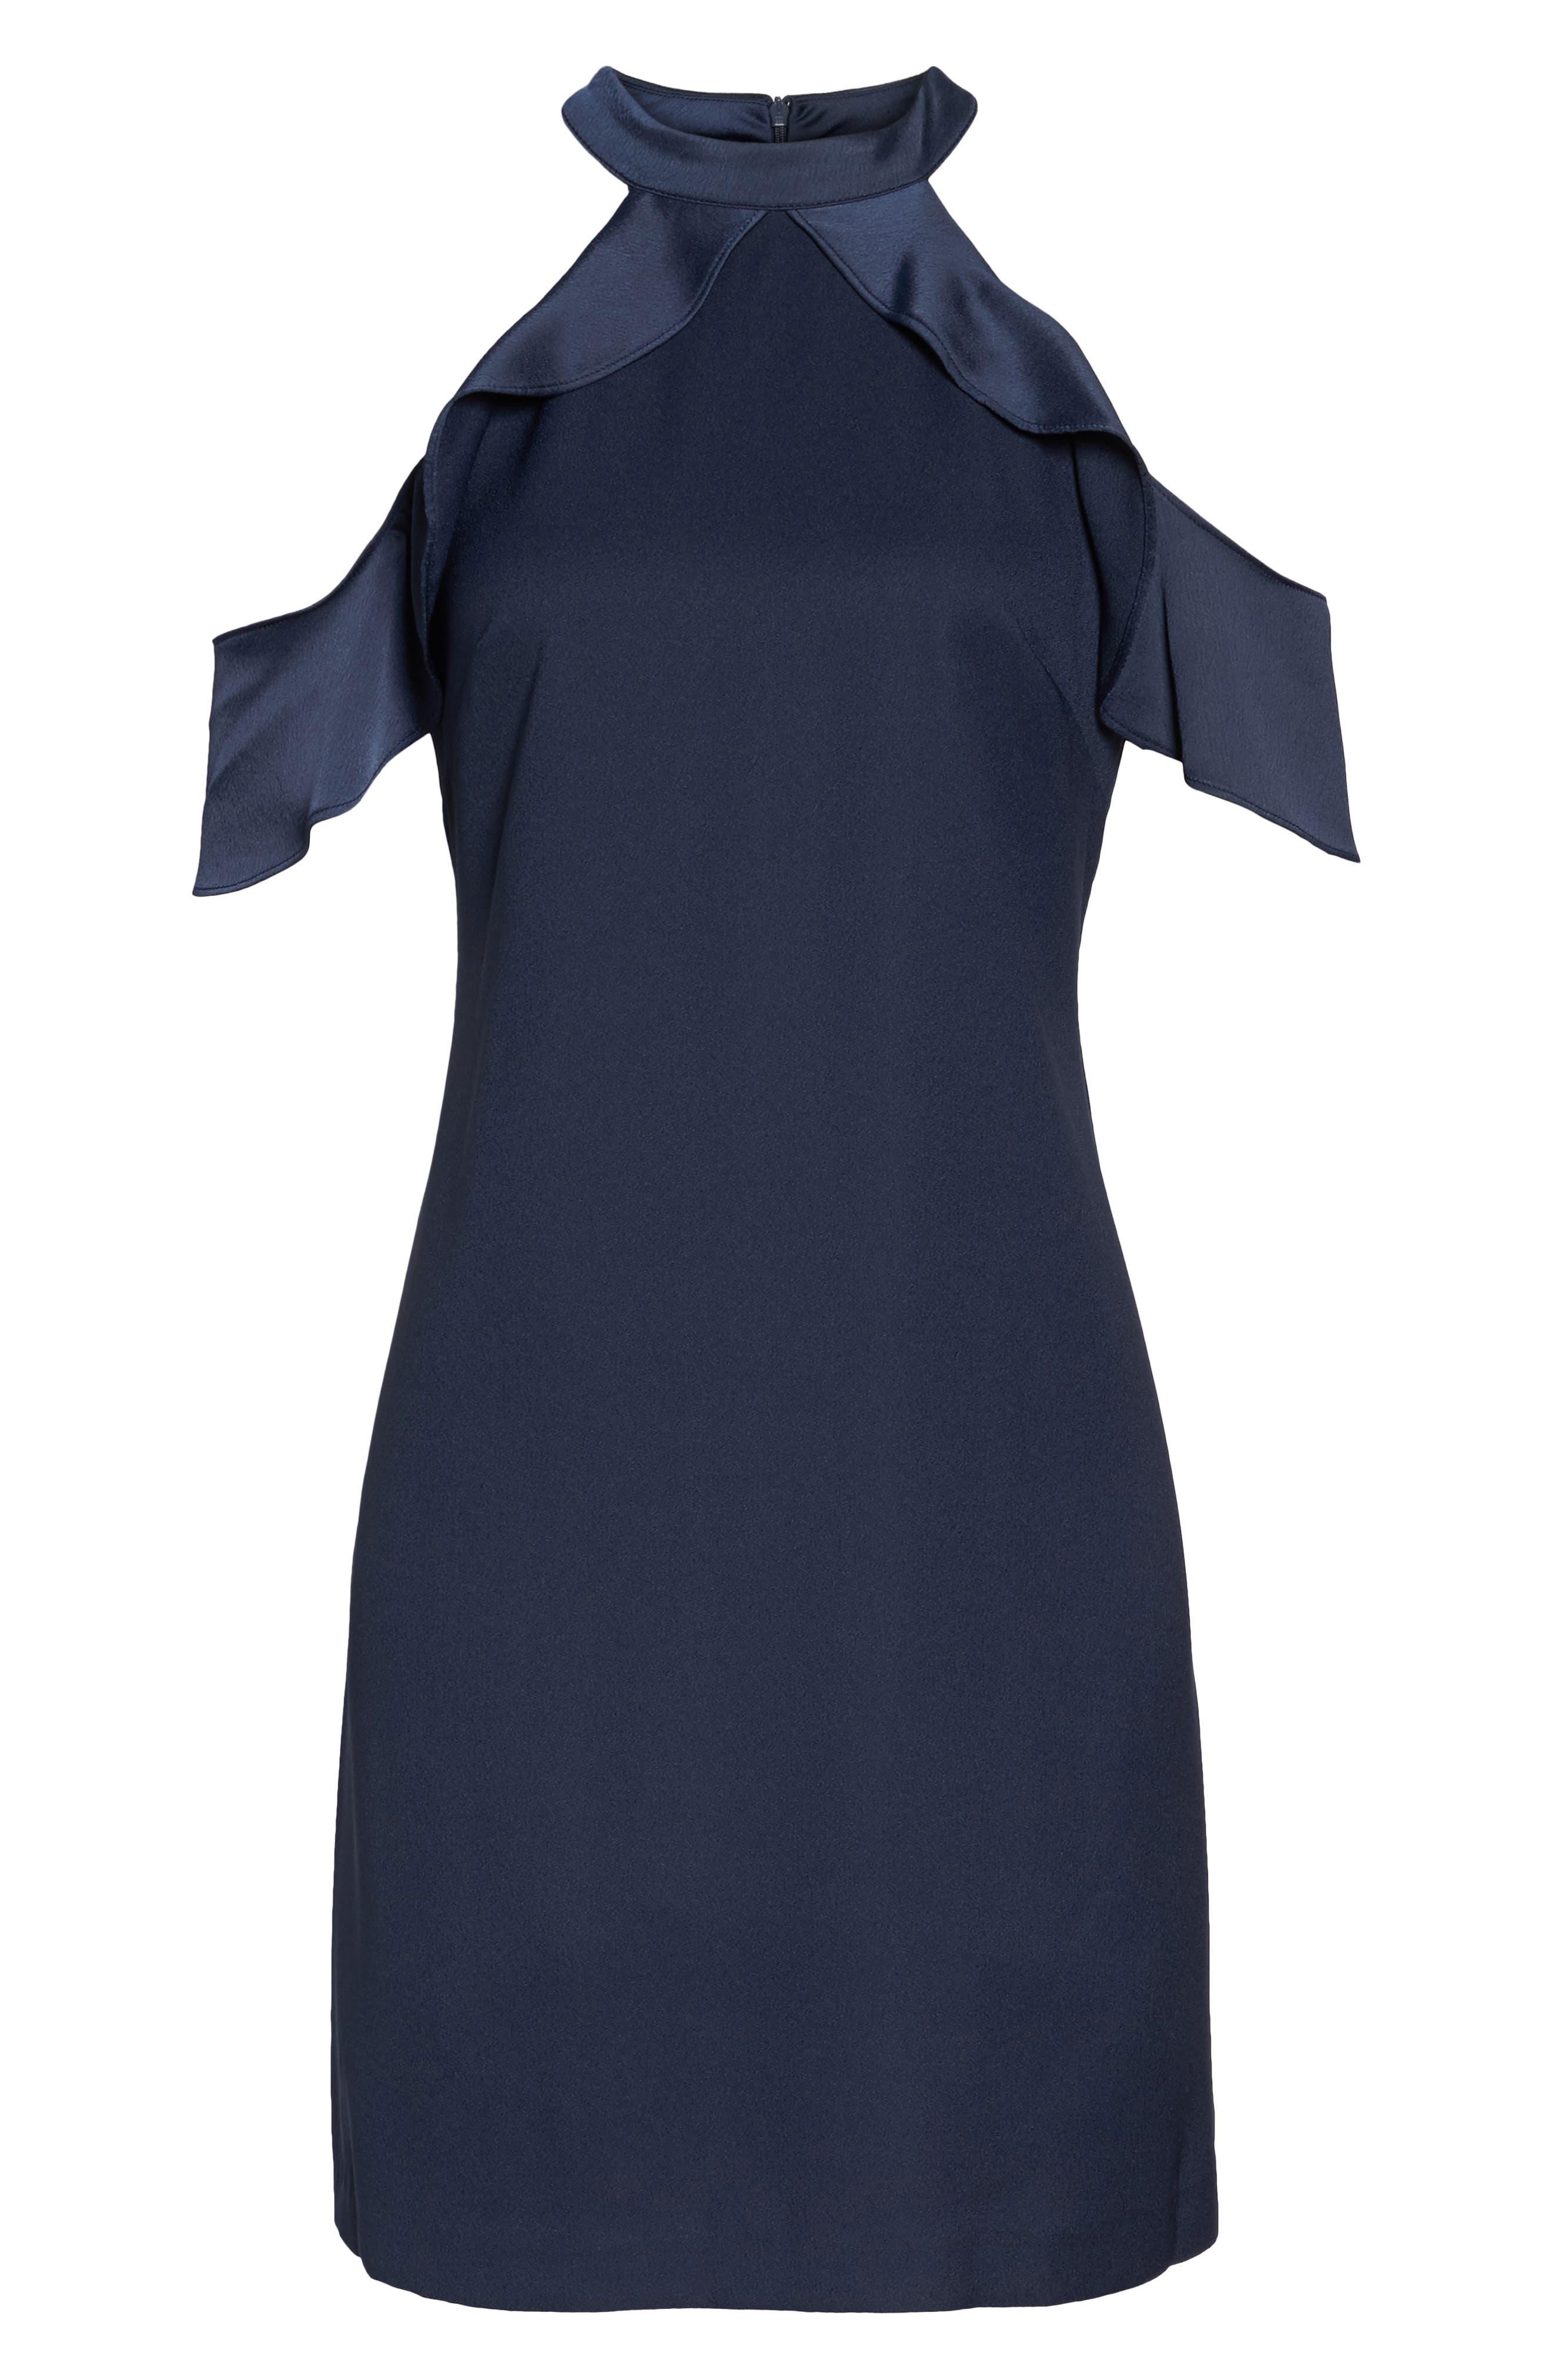 Cold Shoulder Satin Trim Dress,                             Alternate thumbnail 7, color,                             Navy